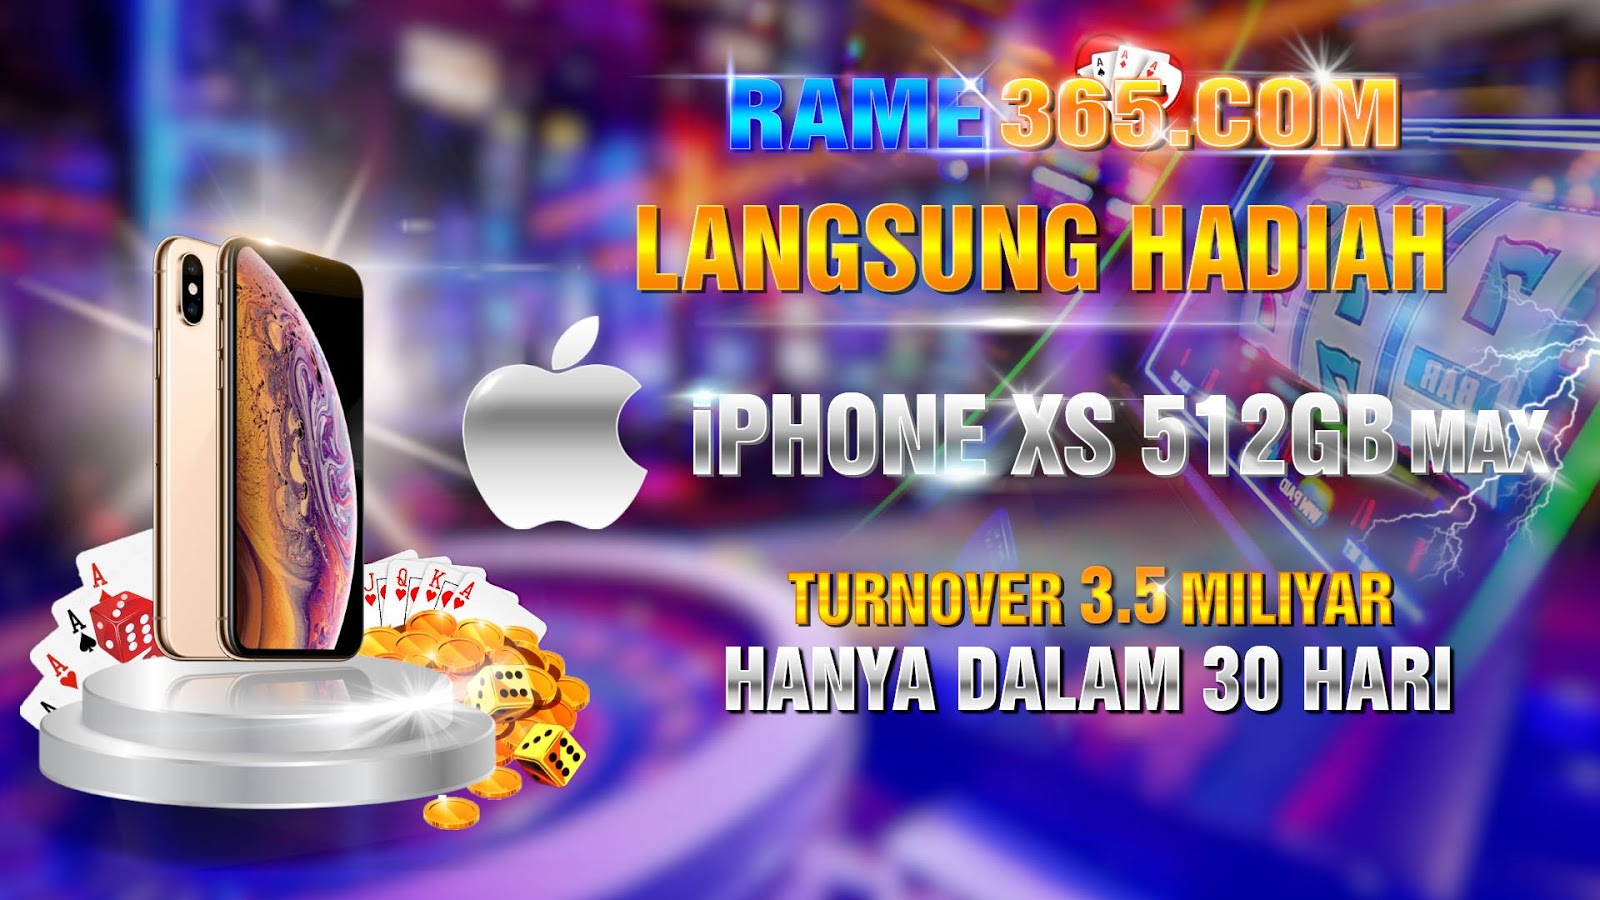 Hadiah IPHONE XS MAX